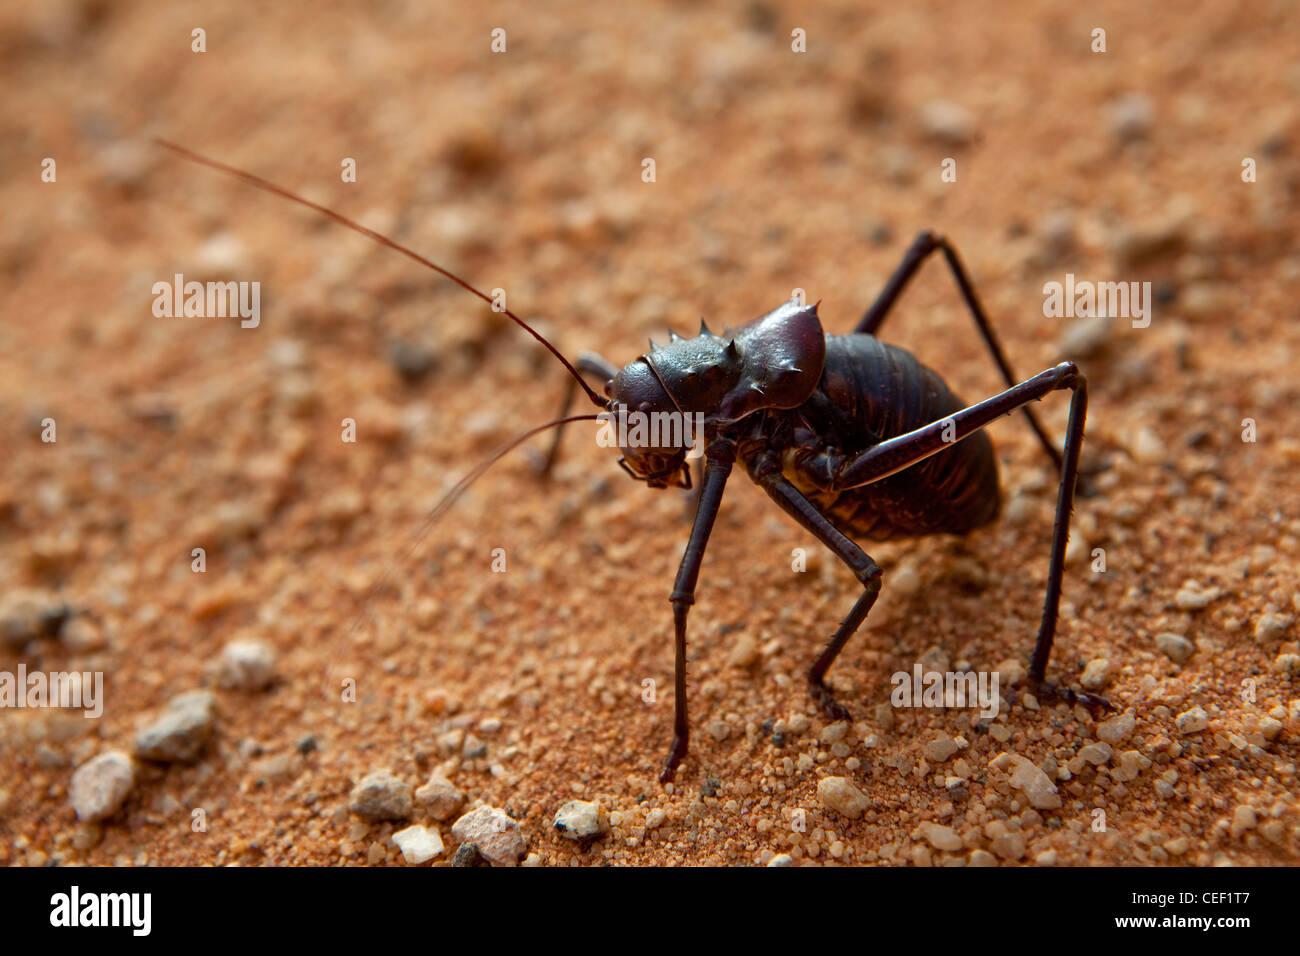 Dune Cricket, Deserto Kalahari, Namibia, Africa Immagini Stock